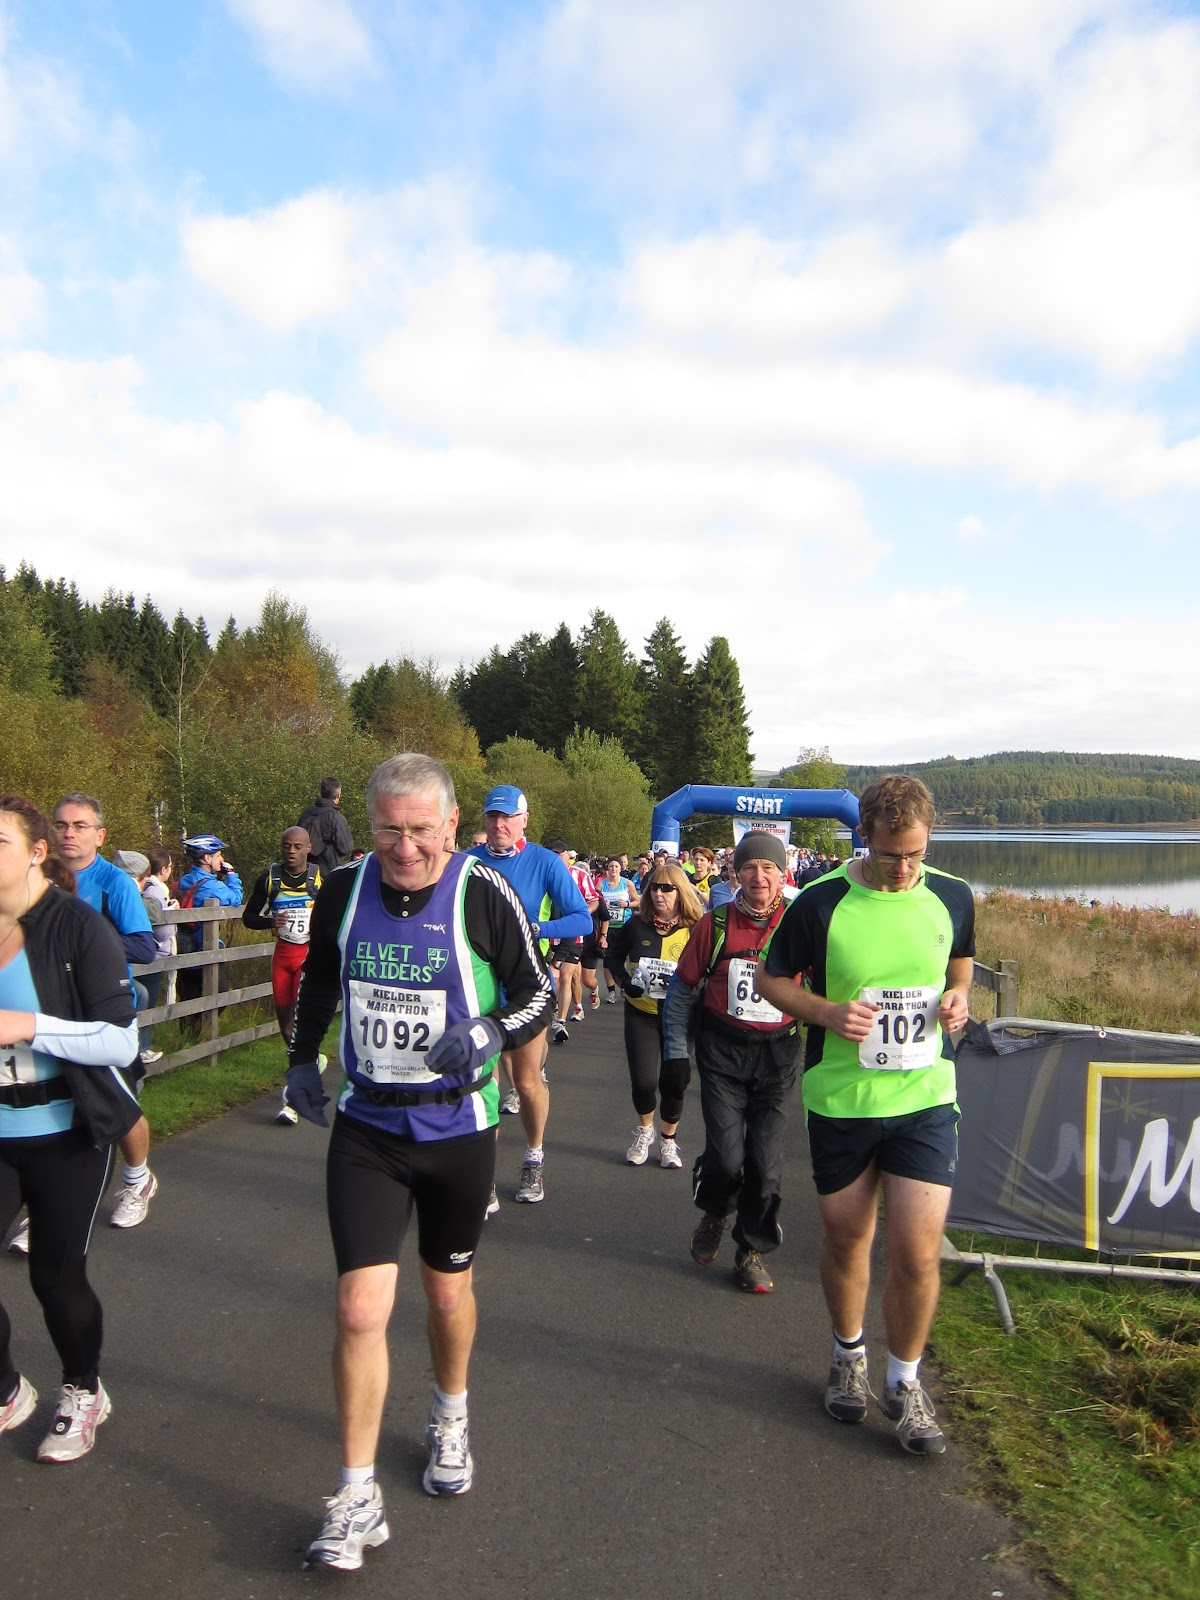 Kielder -- Alan Purvis -- Kielder Marathon - 2010 -- (United Kingdom - England - Falstone - Falstone) -- Sun 17 Oct 2010 10-20-55 BST.jpg